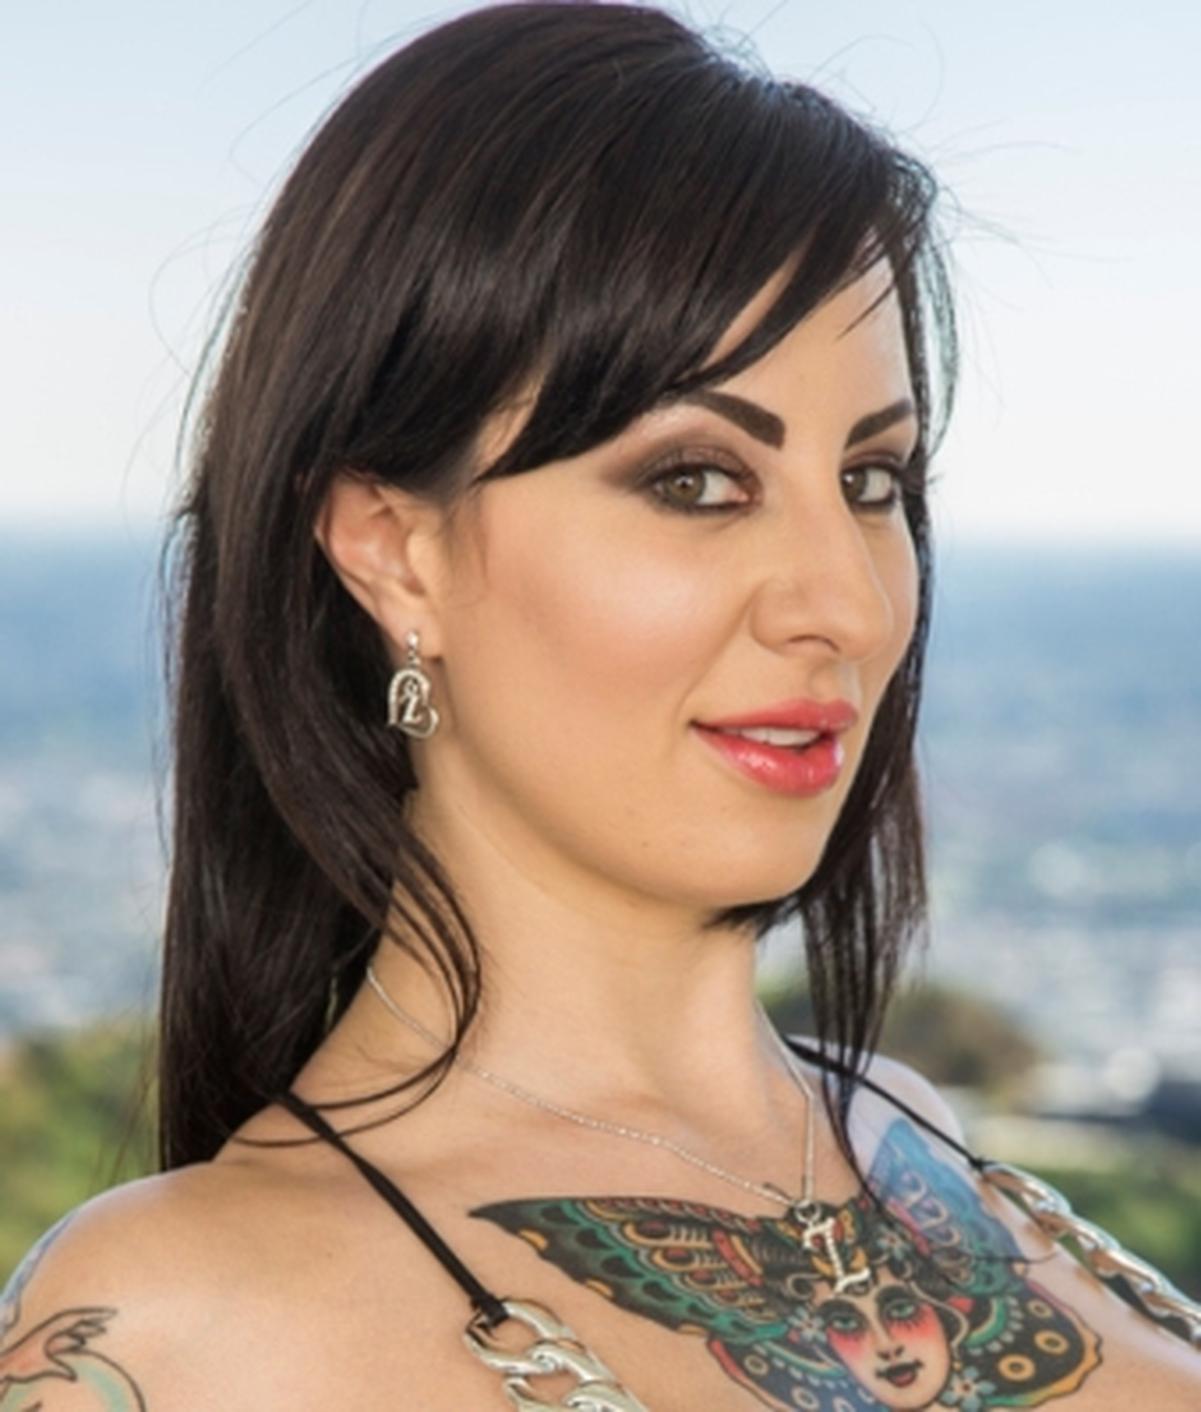 Dollie Darko   Wiki & Bio   Everipedia